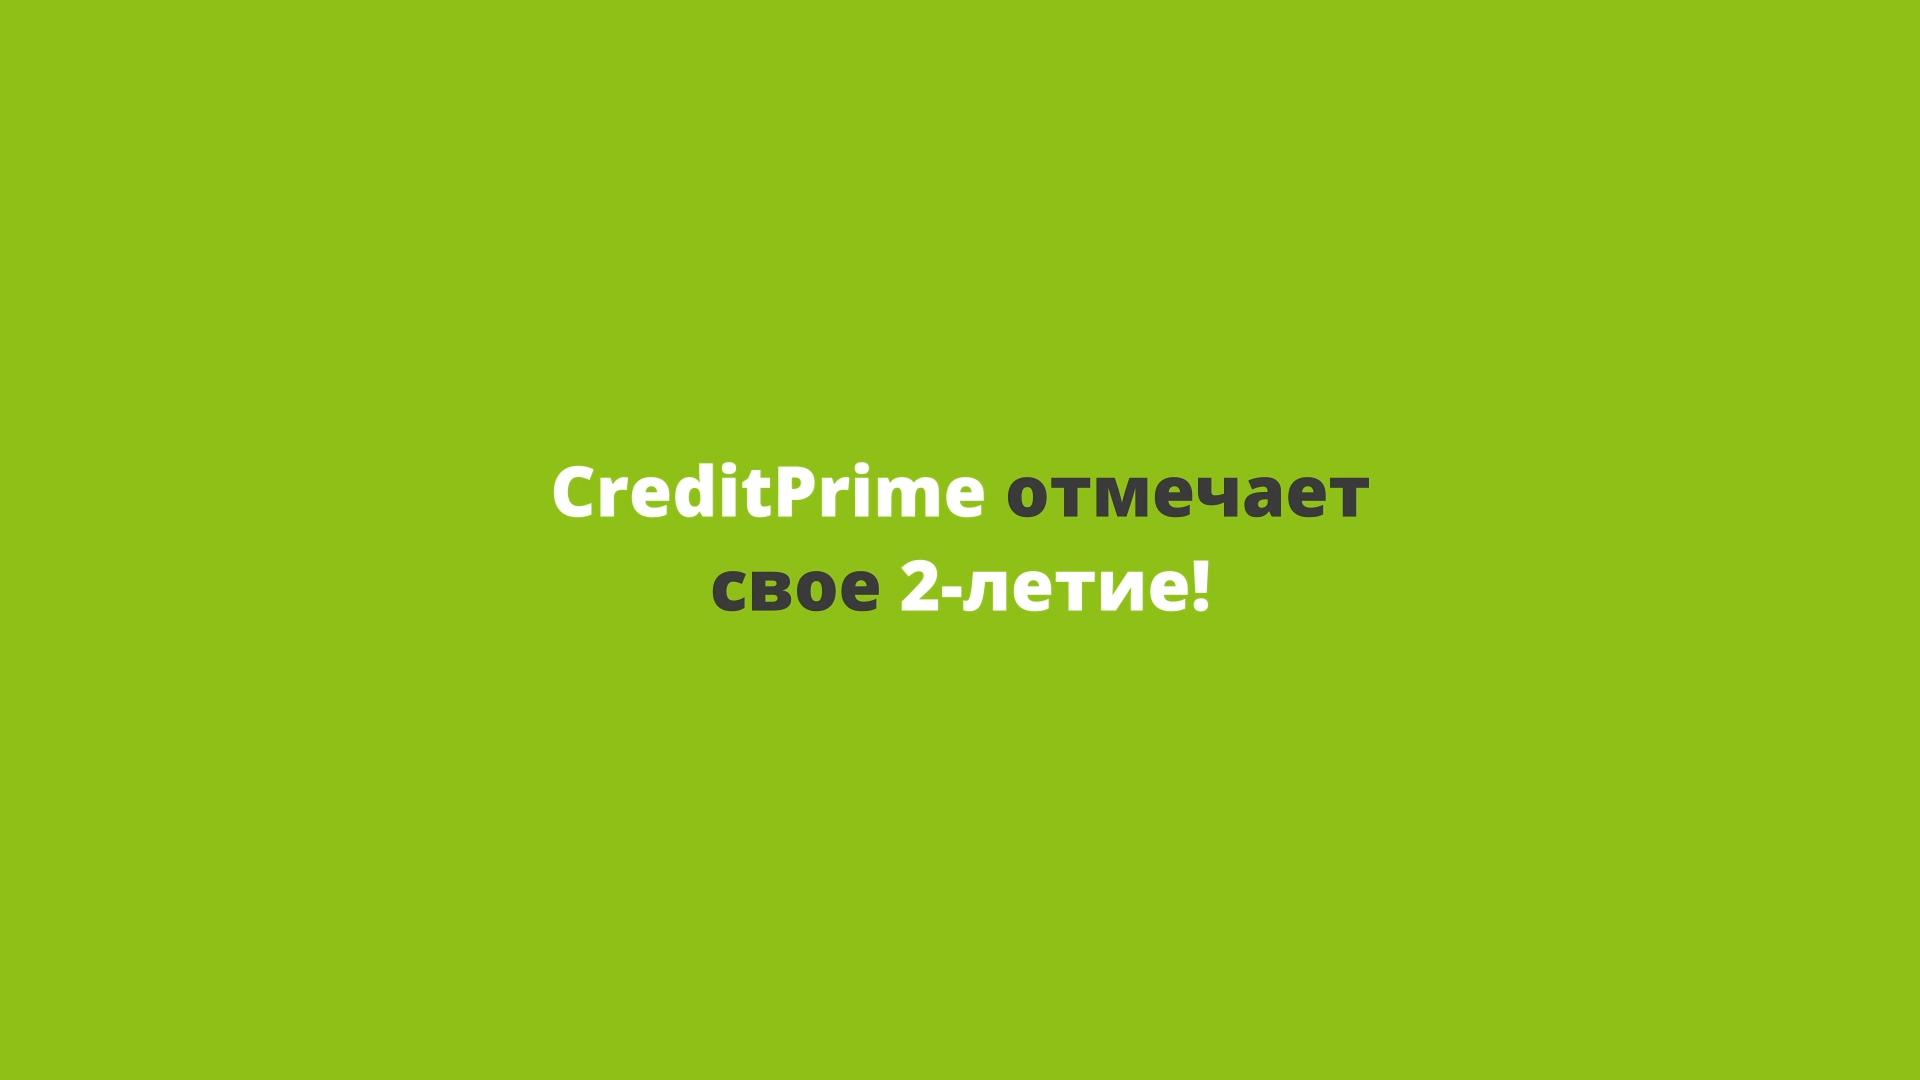 У CreditPrime праздник – нам 2 года!